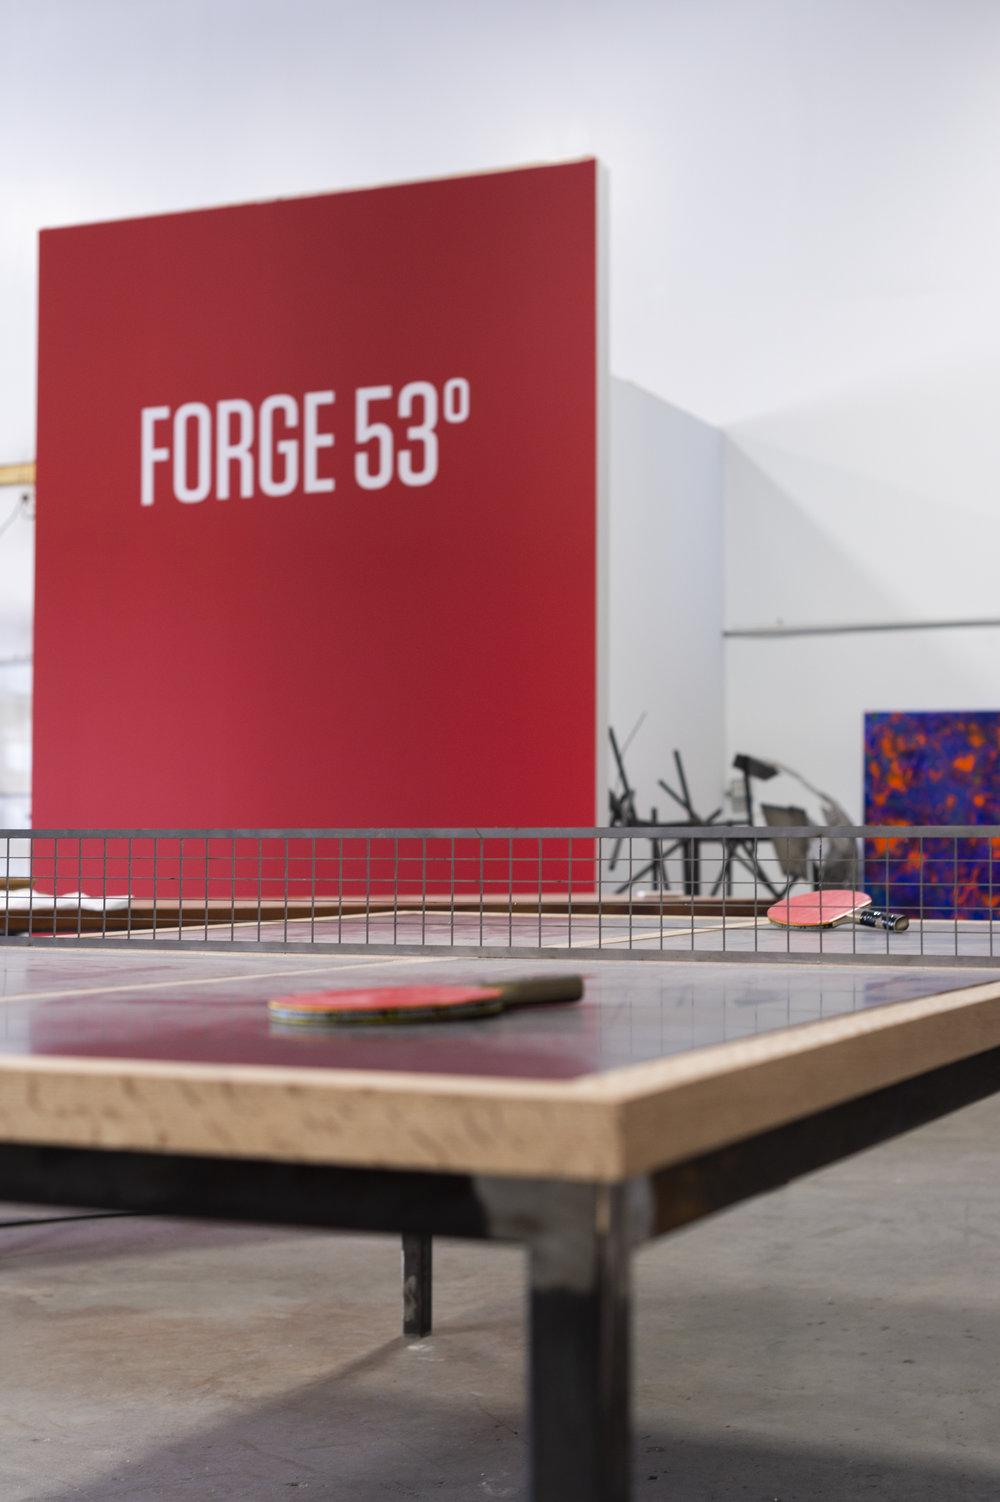 Forge 53 Edmonton